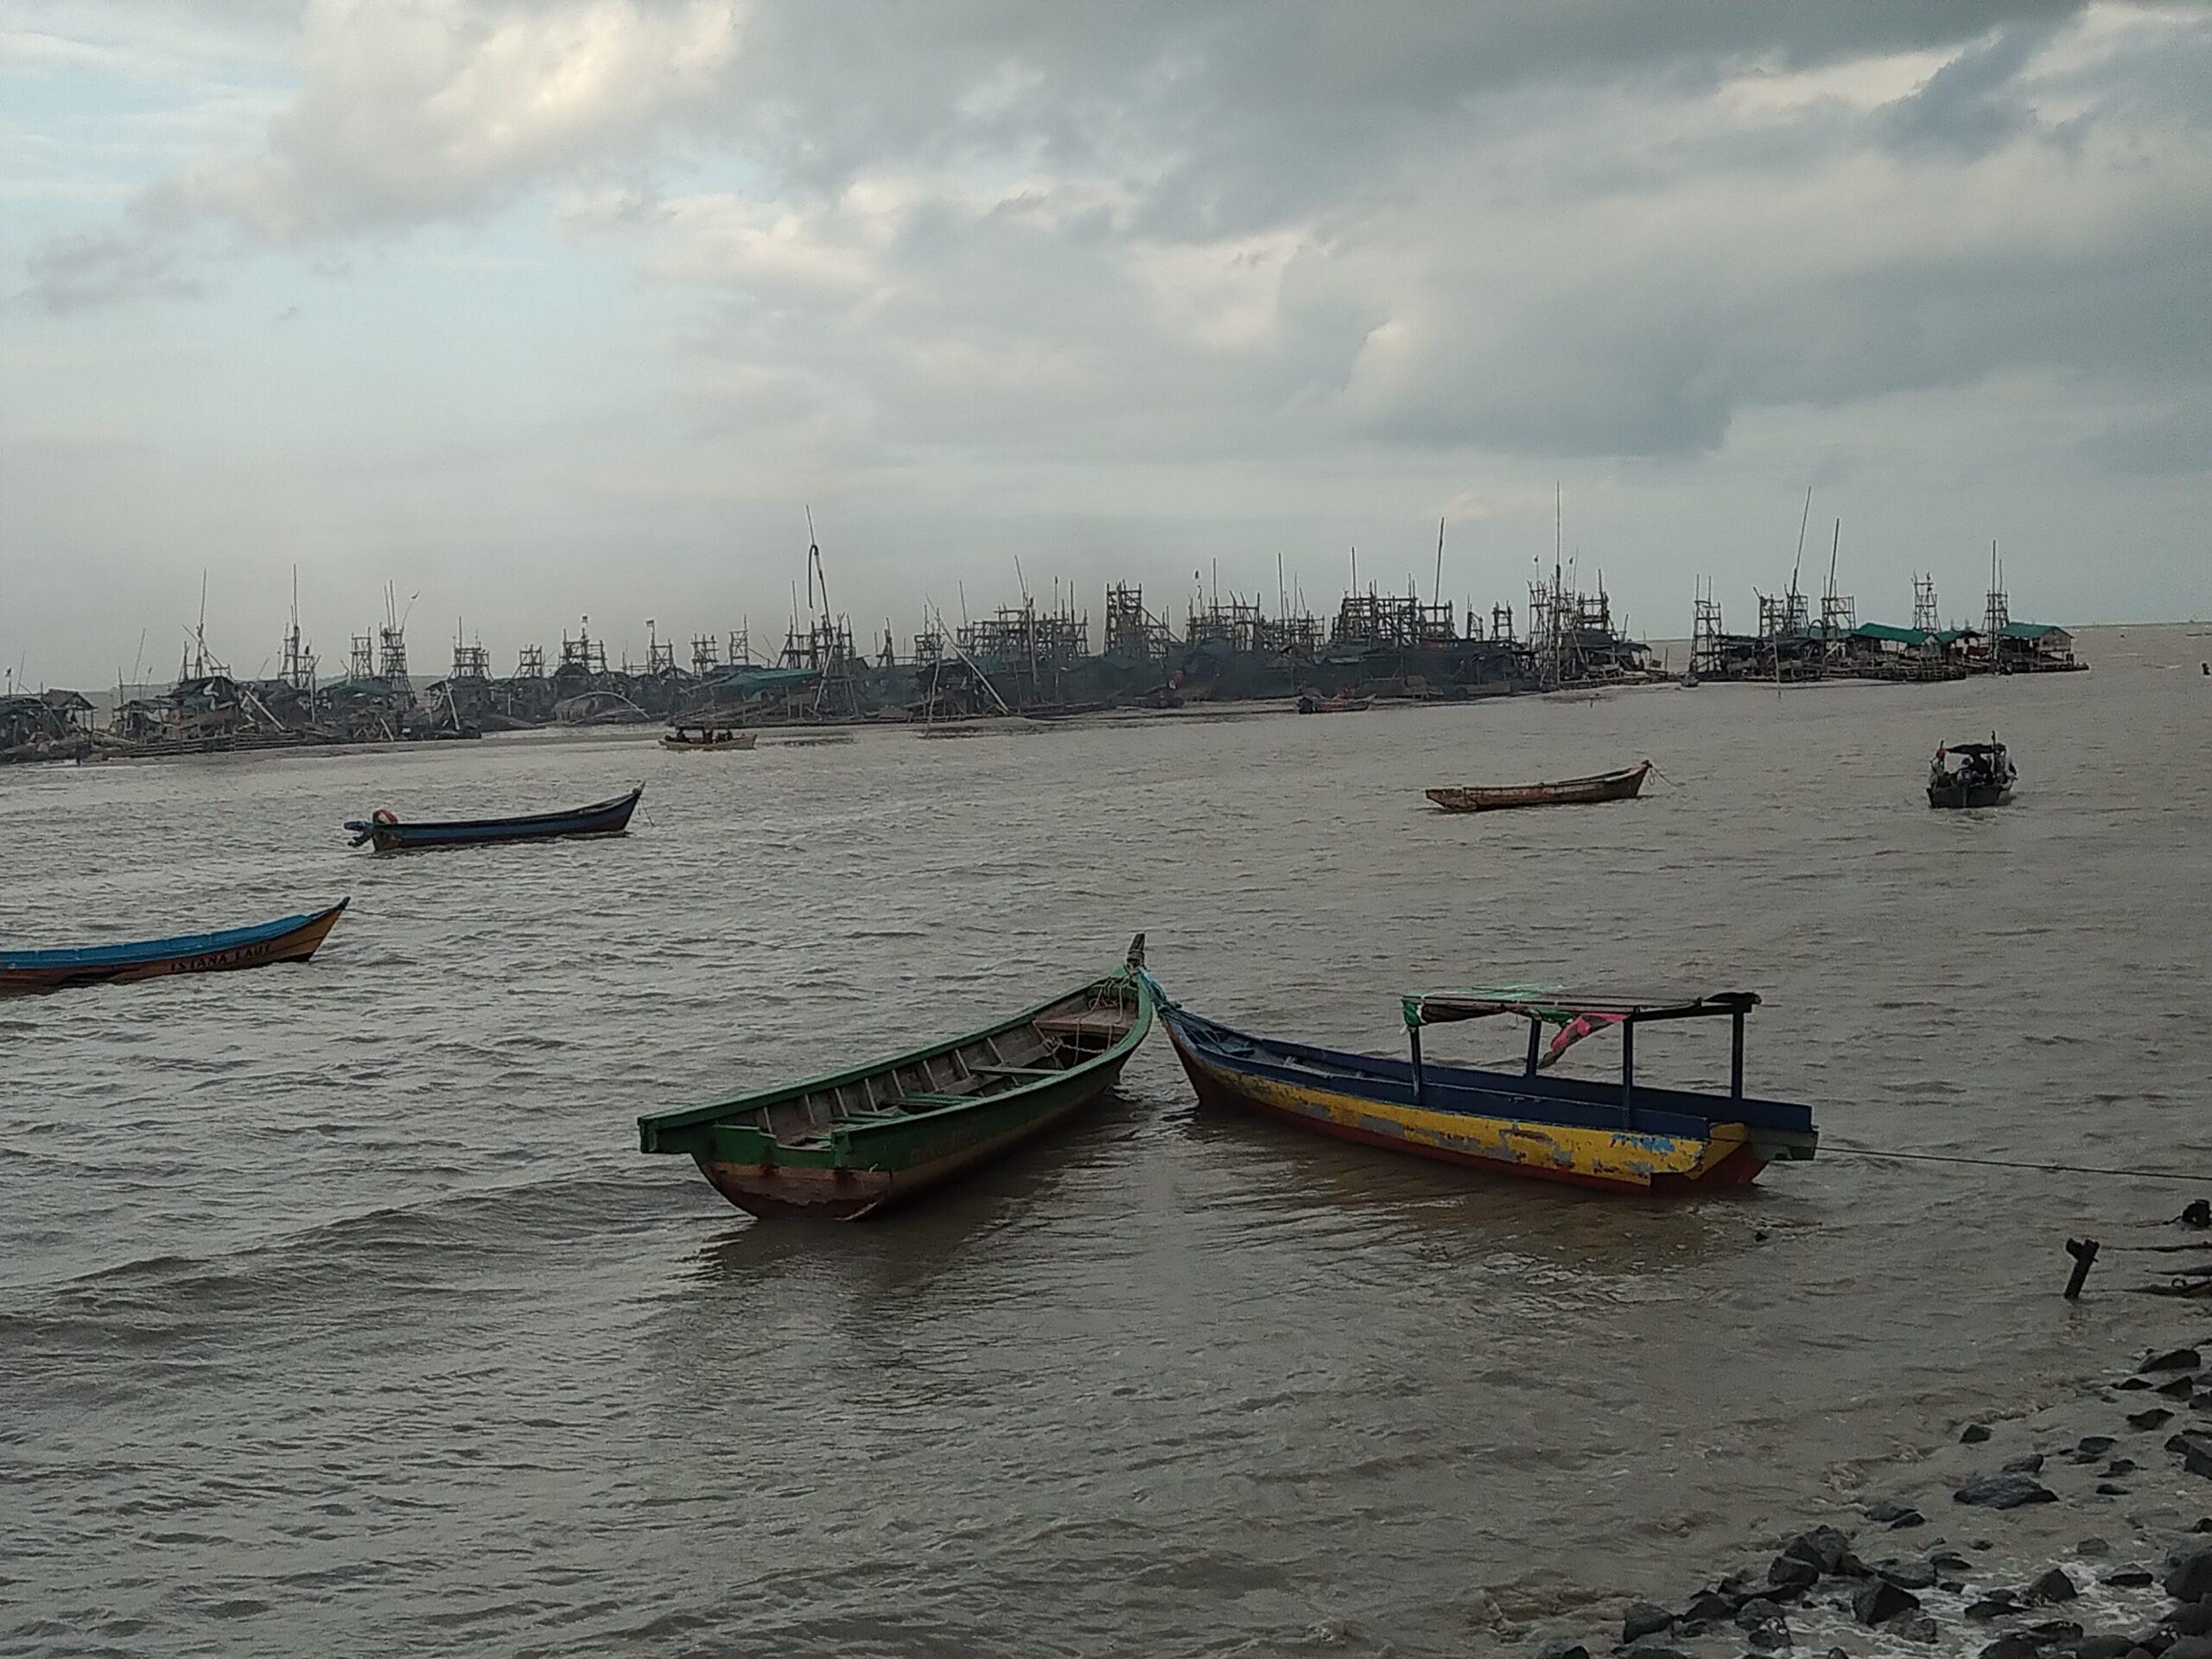 Berjarak Kurang dari 100 Meter dari Bibir Pantai,Tambang Rajuk Samfur Beroperasi